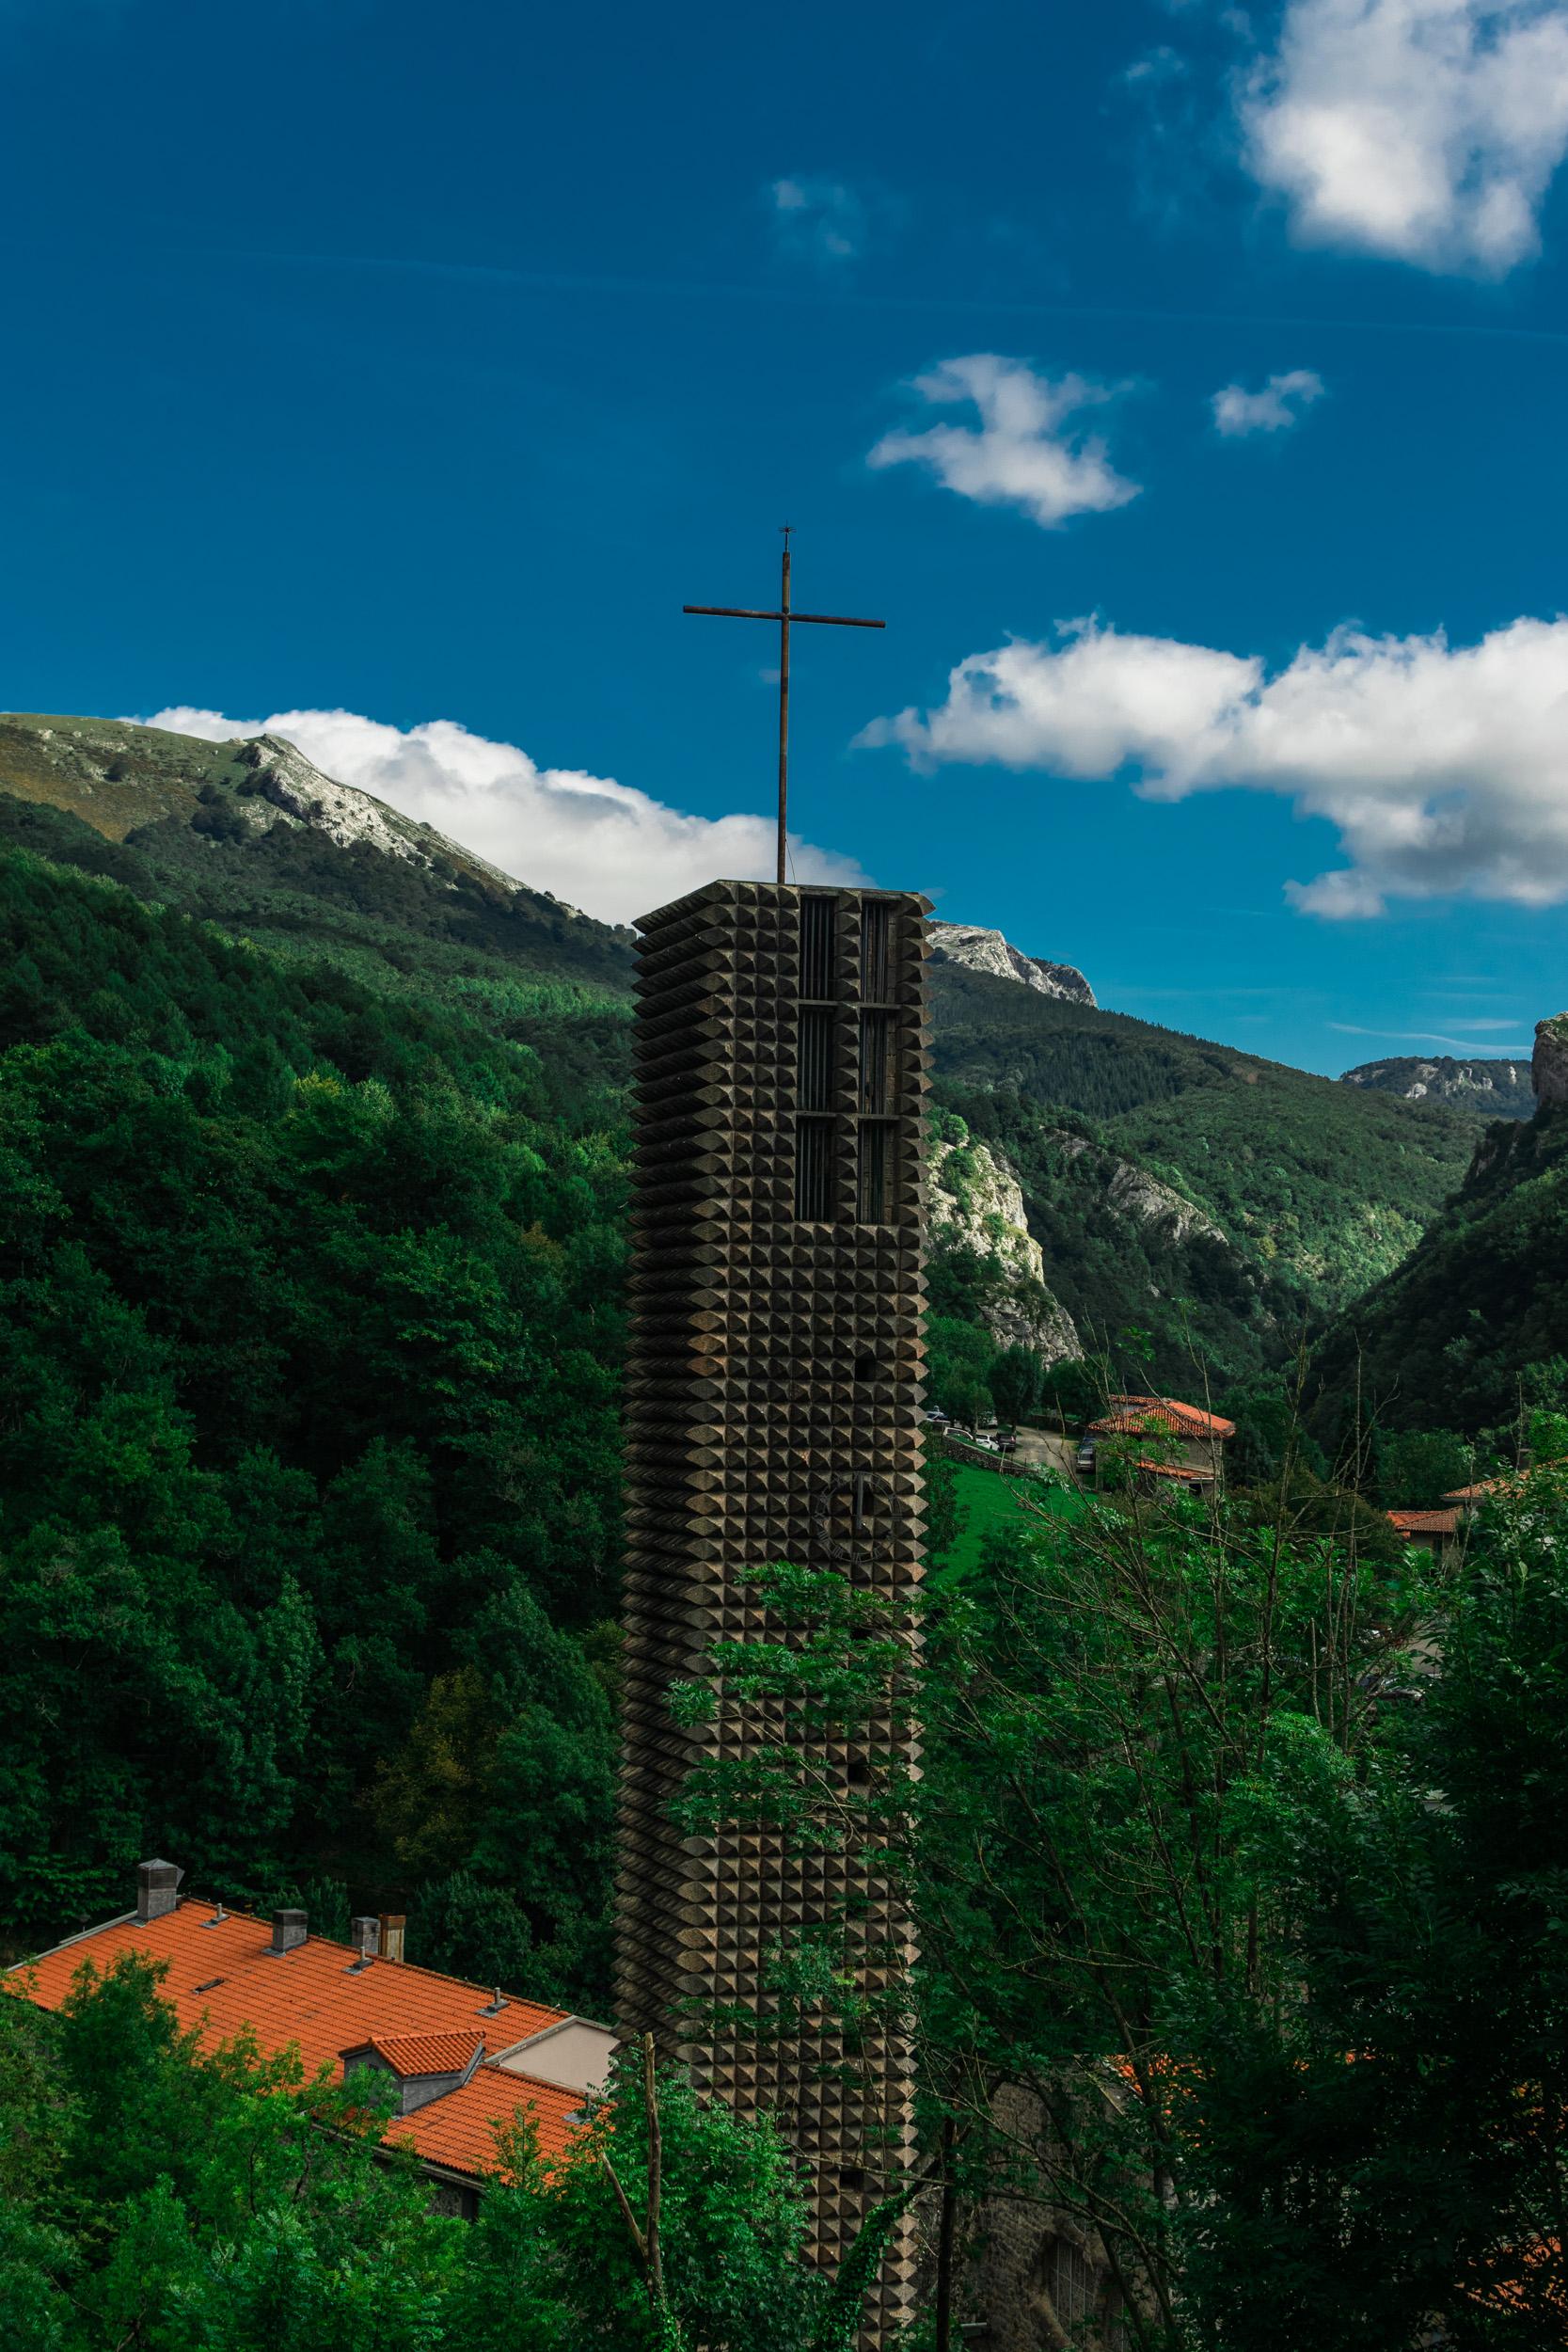 cross of Sanctuary of Arantzazu